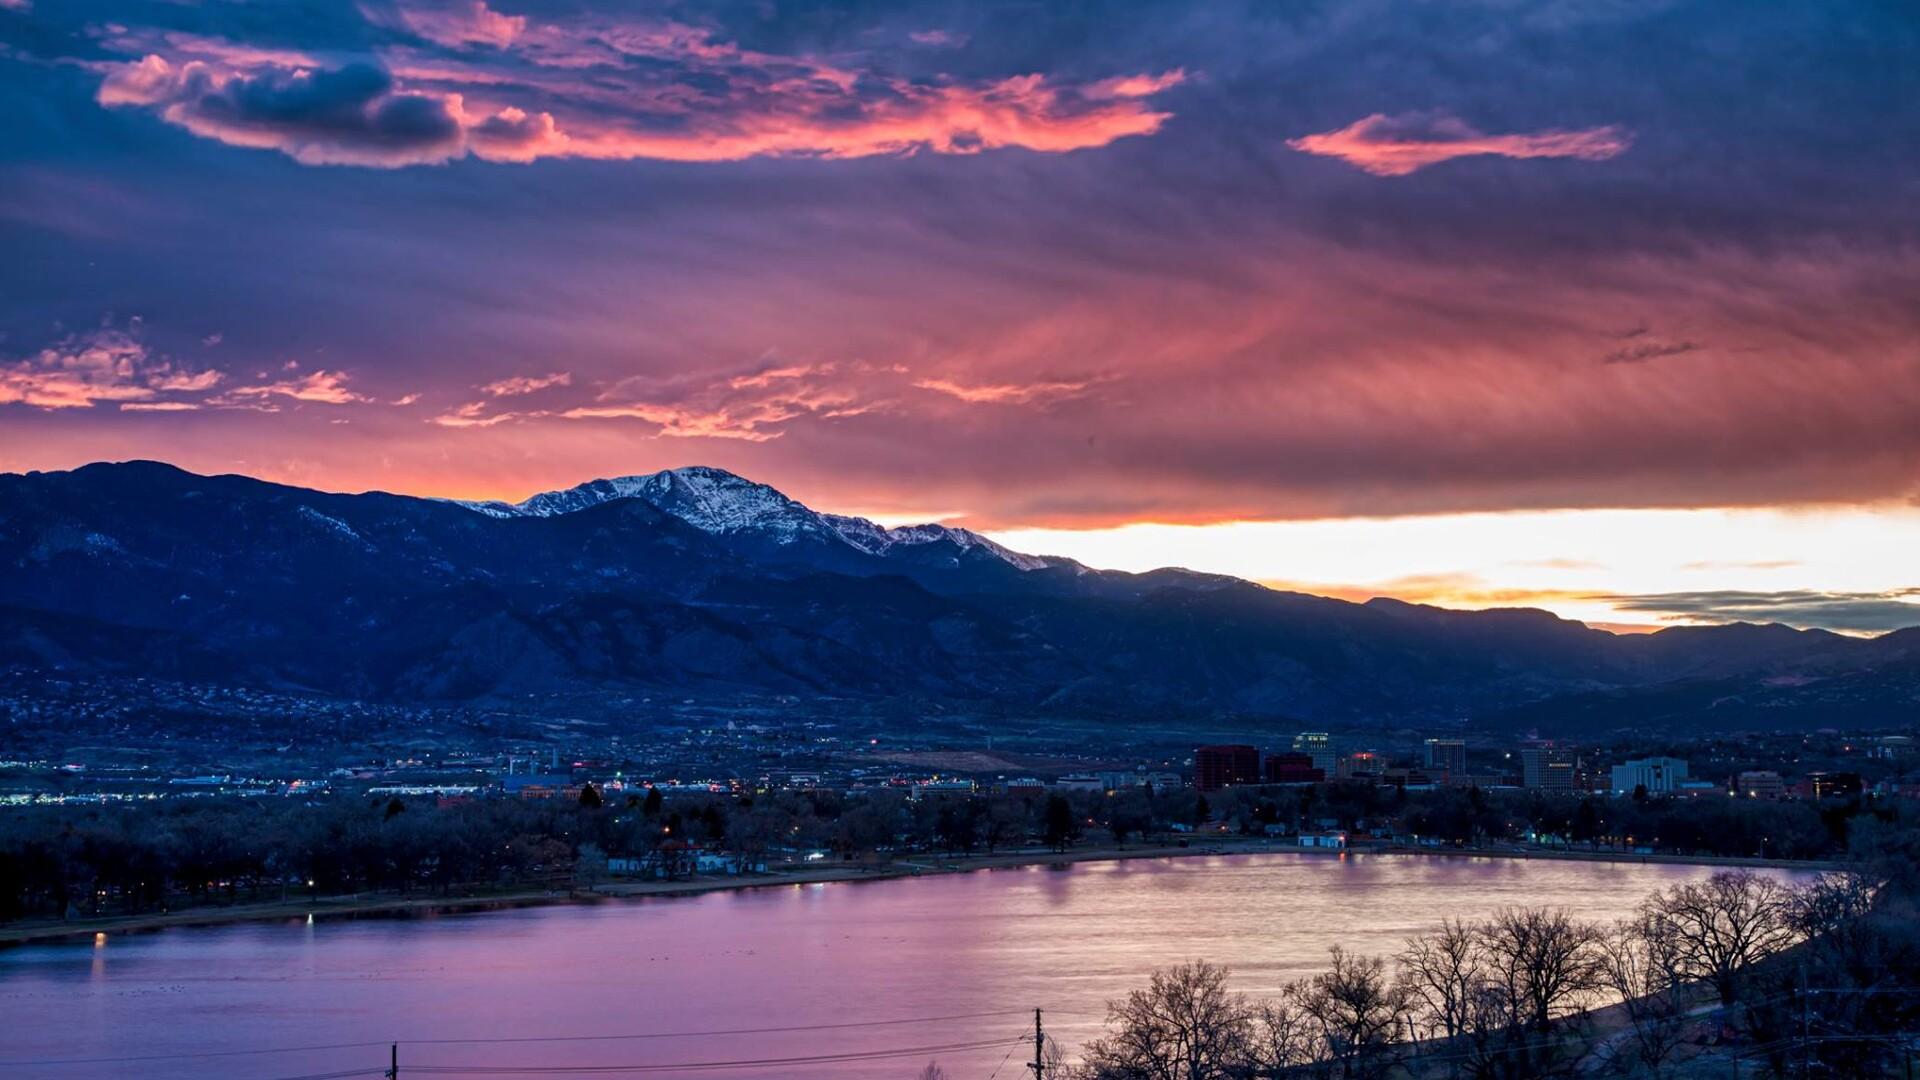 Pikes Peak Sunset Larry Marr.jpg